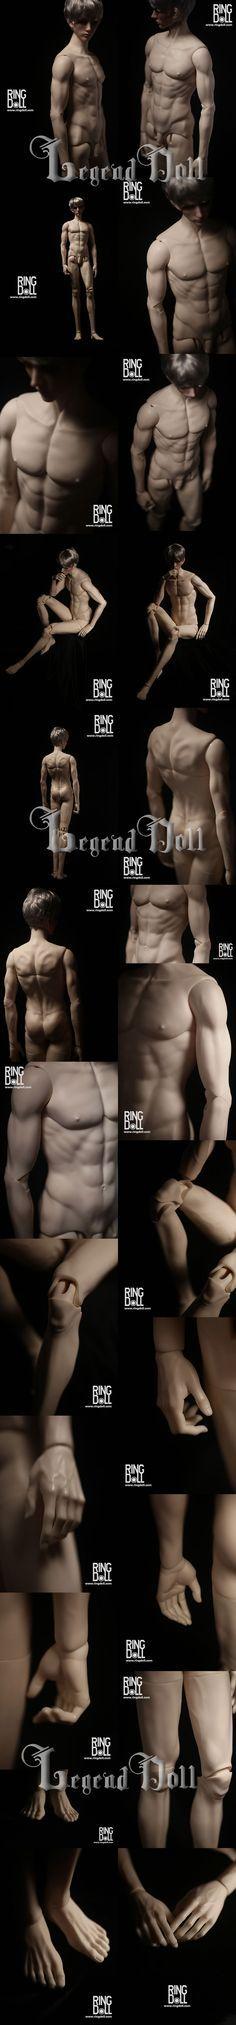 BJD 70cm Male Muscle Body RGMbody-3 Ball-jointed doll_RING DOLL_DOll body maker_DOLL BODY_Ball Jointed Dolls (BJD) company-Legenddoll